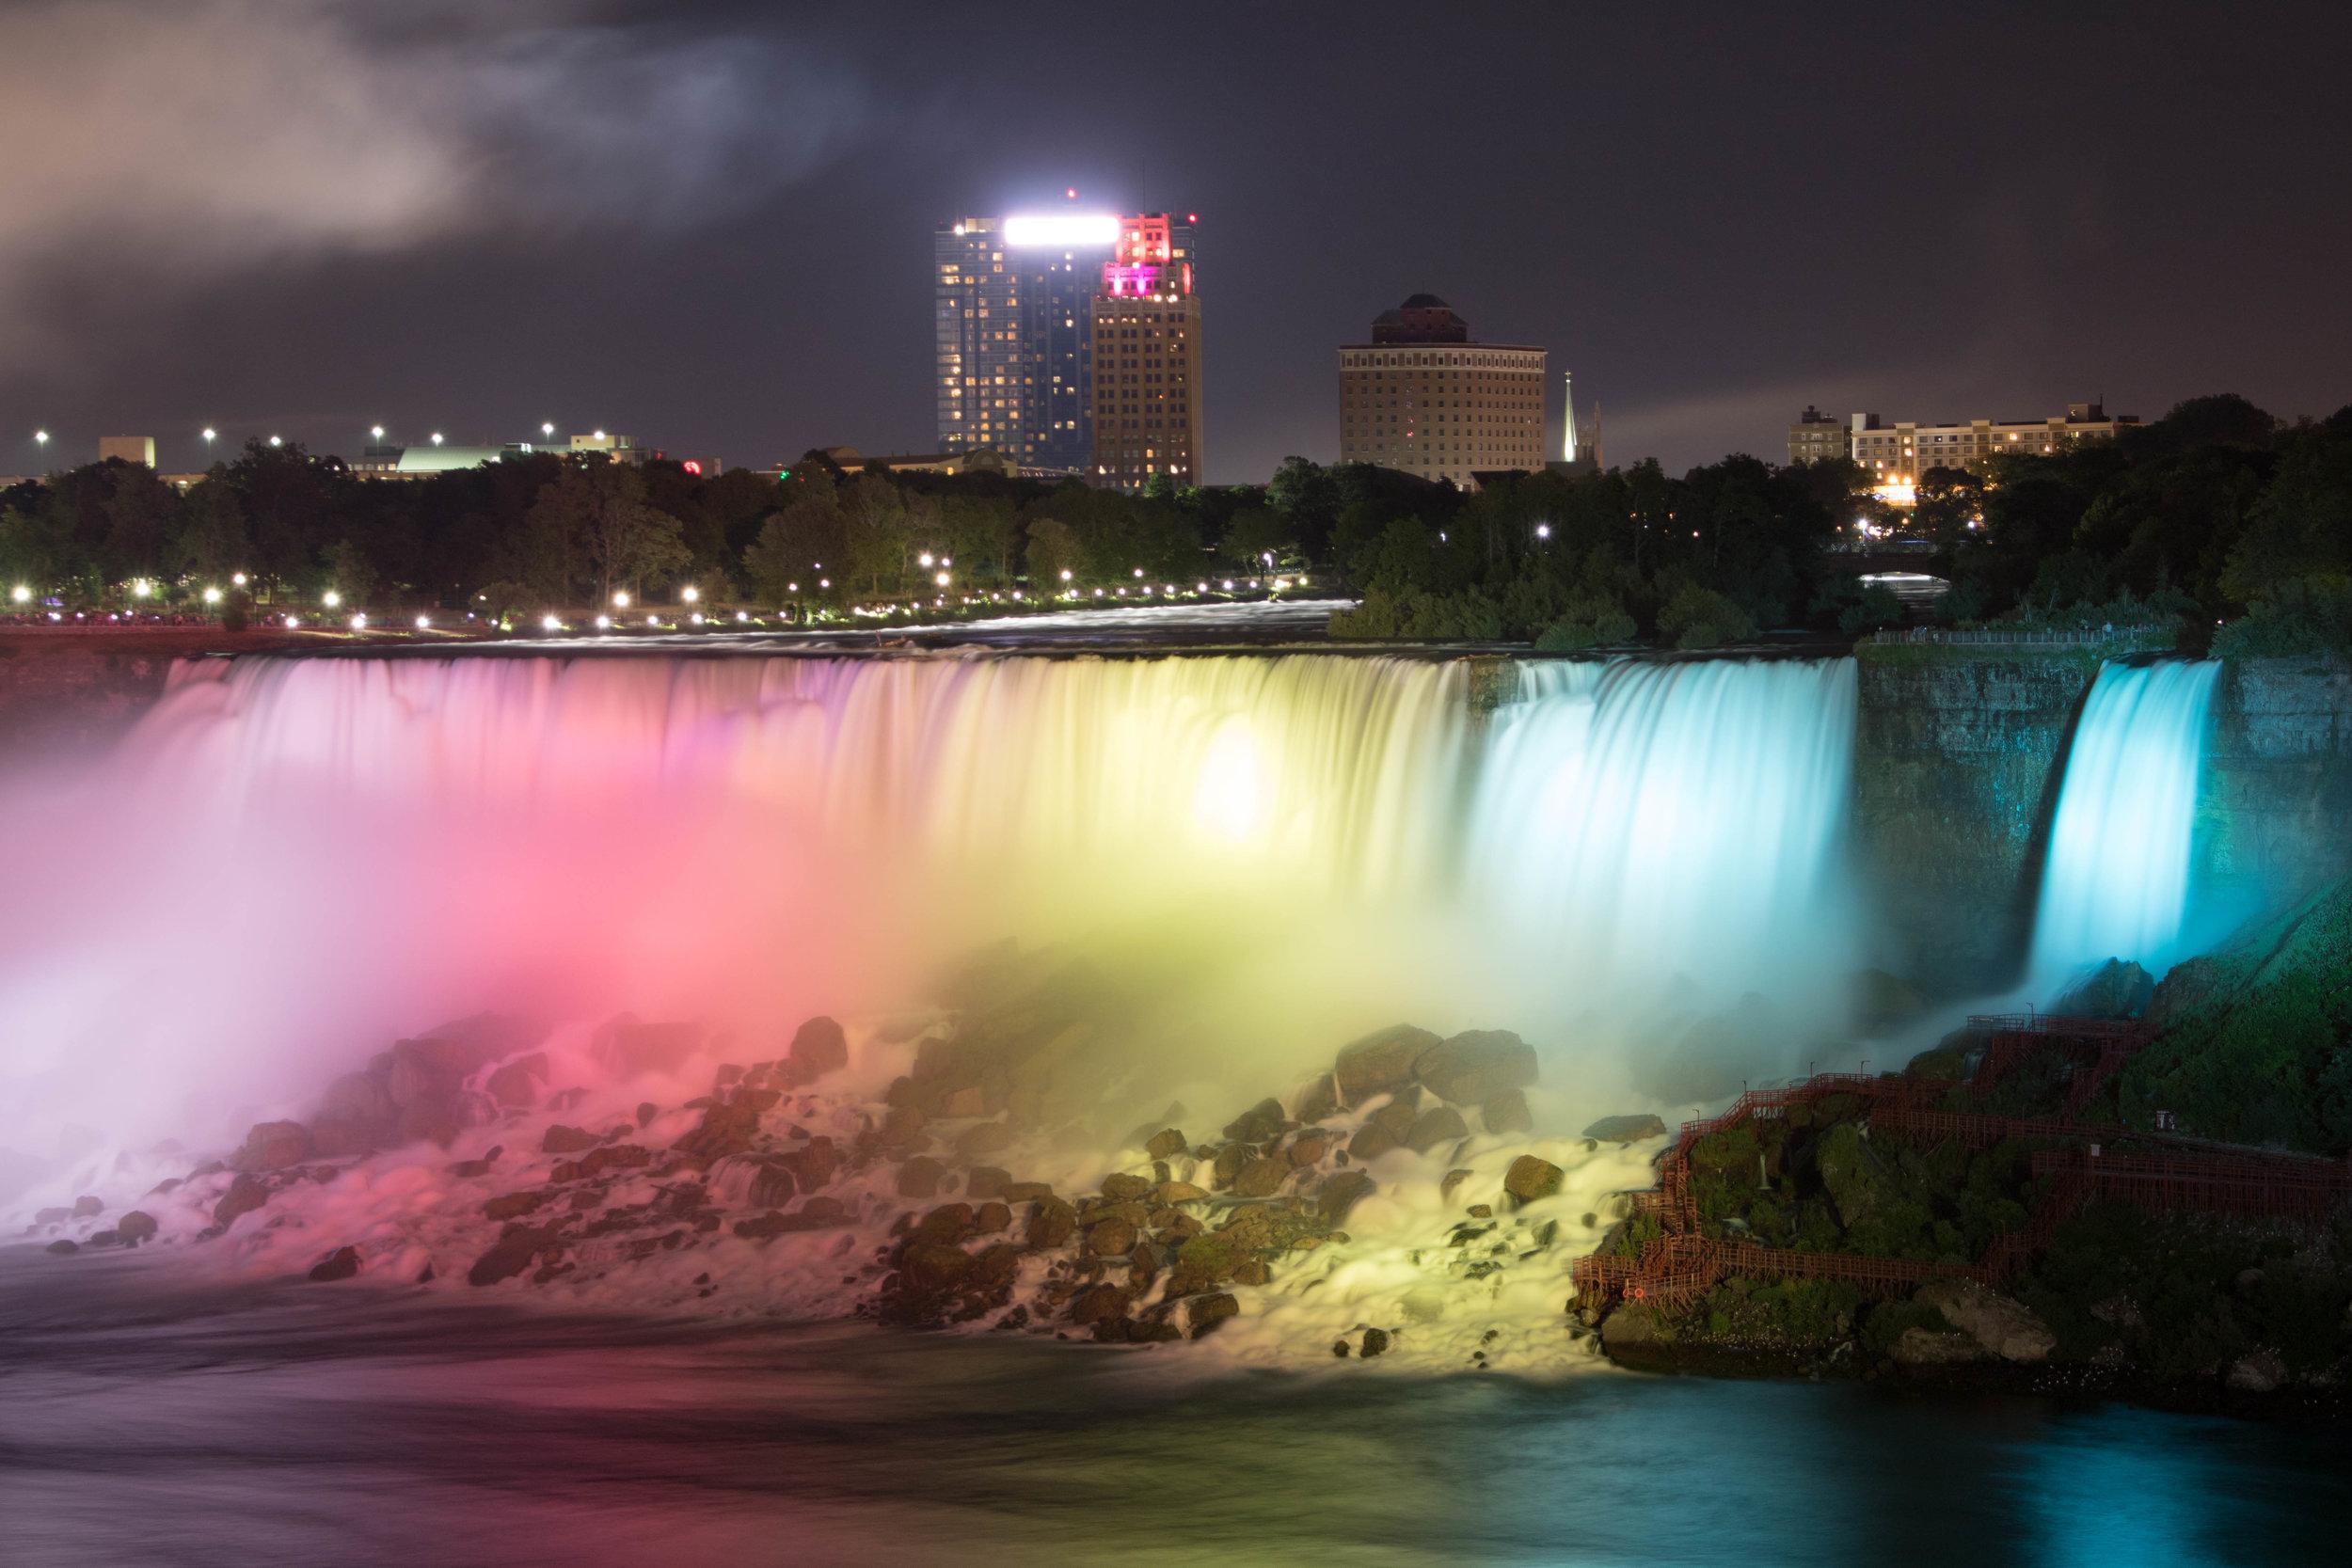 Niagara-Falls-Canada-Nighttime-Long-Exposure-Photography